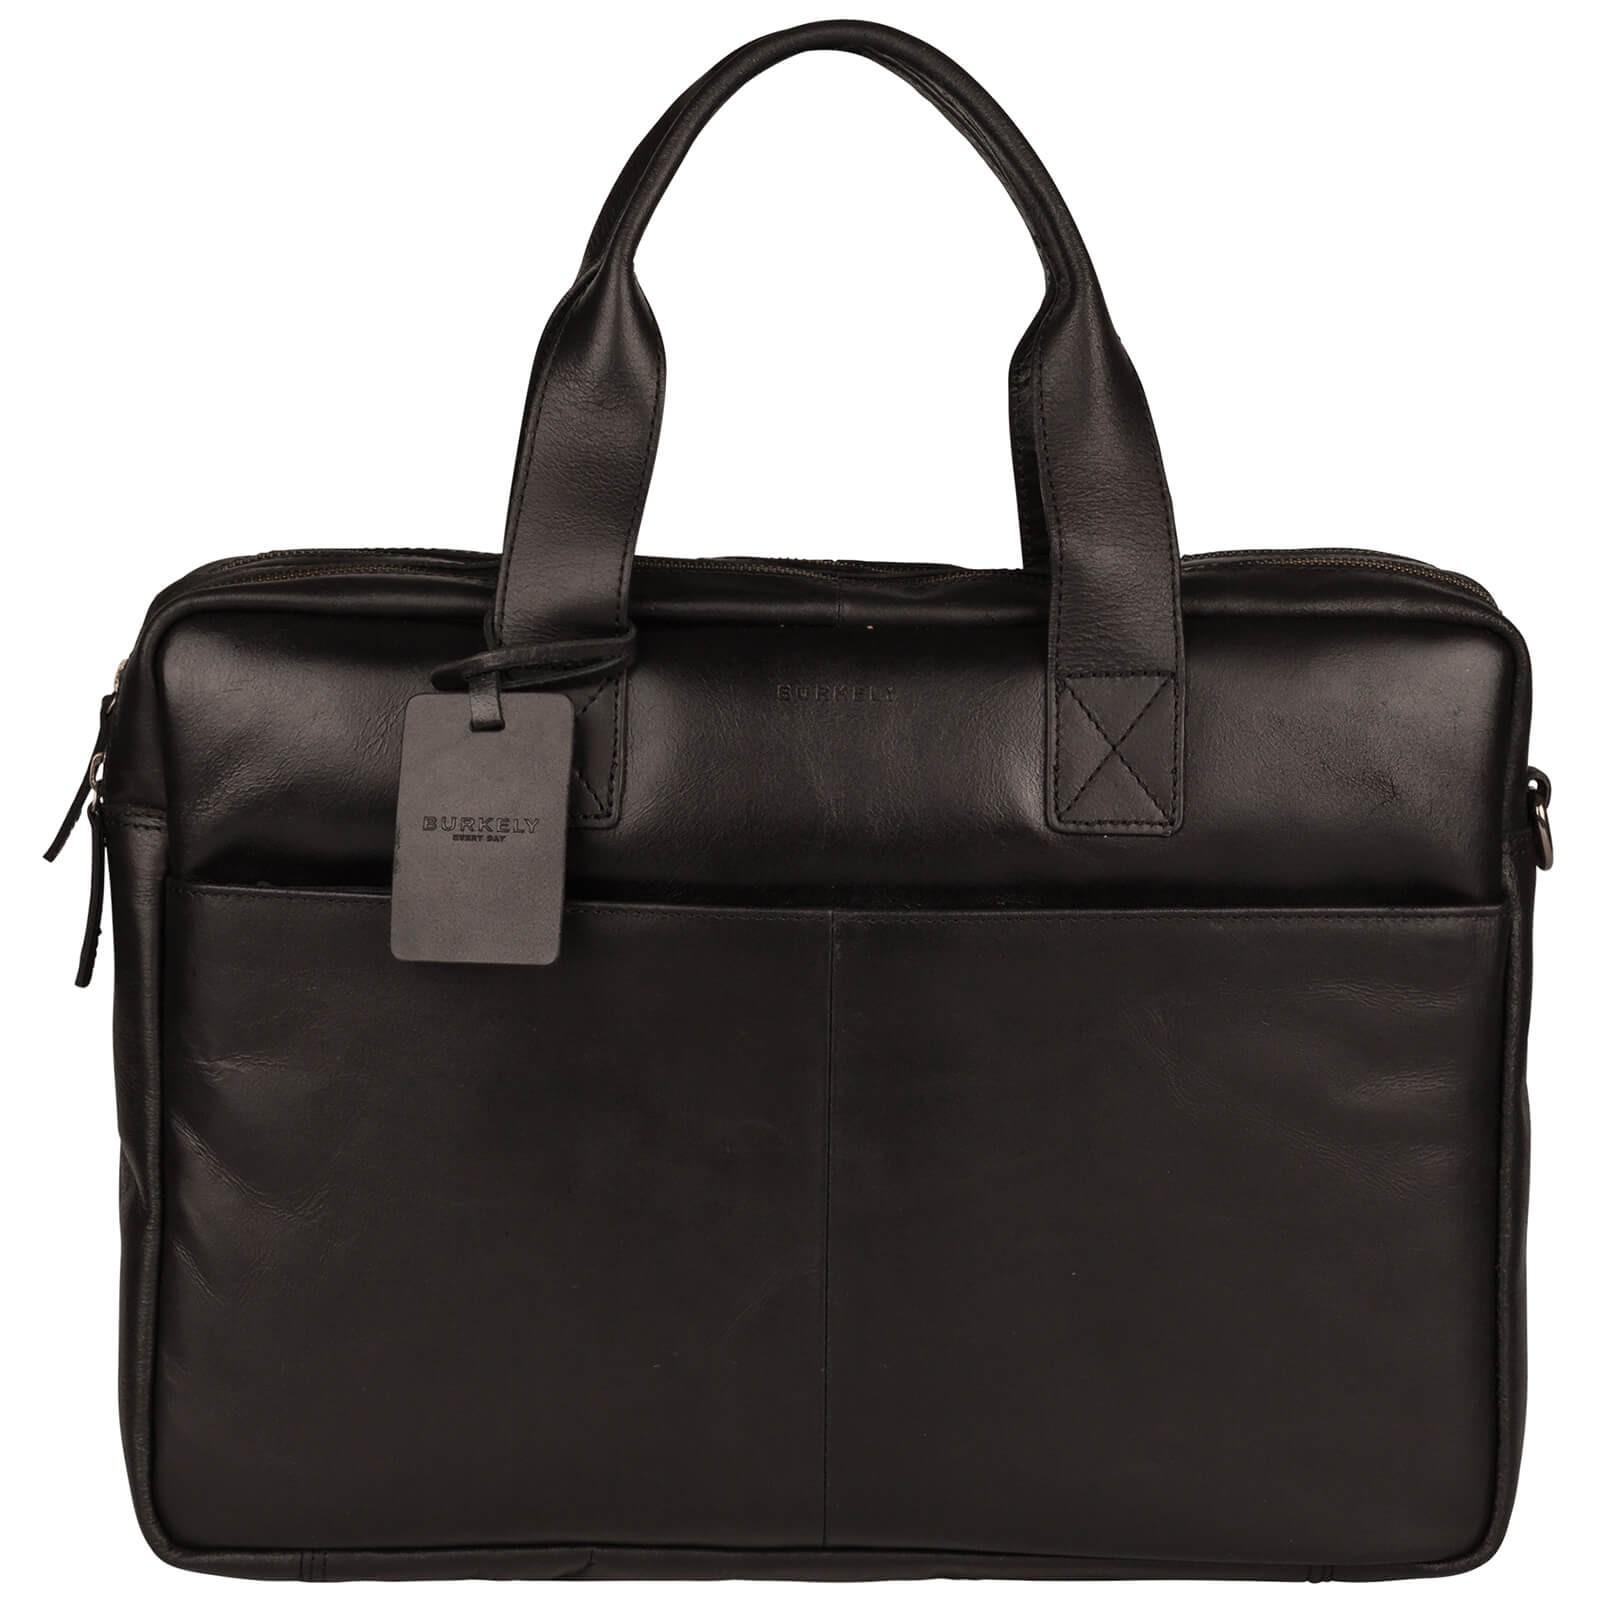 Pánska kožená taška na notebook Burkely Josse - čierna